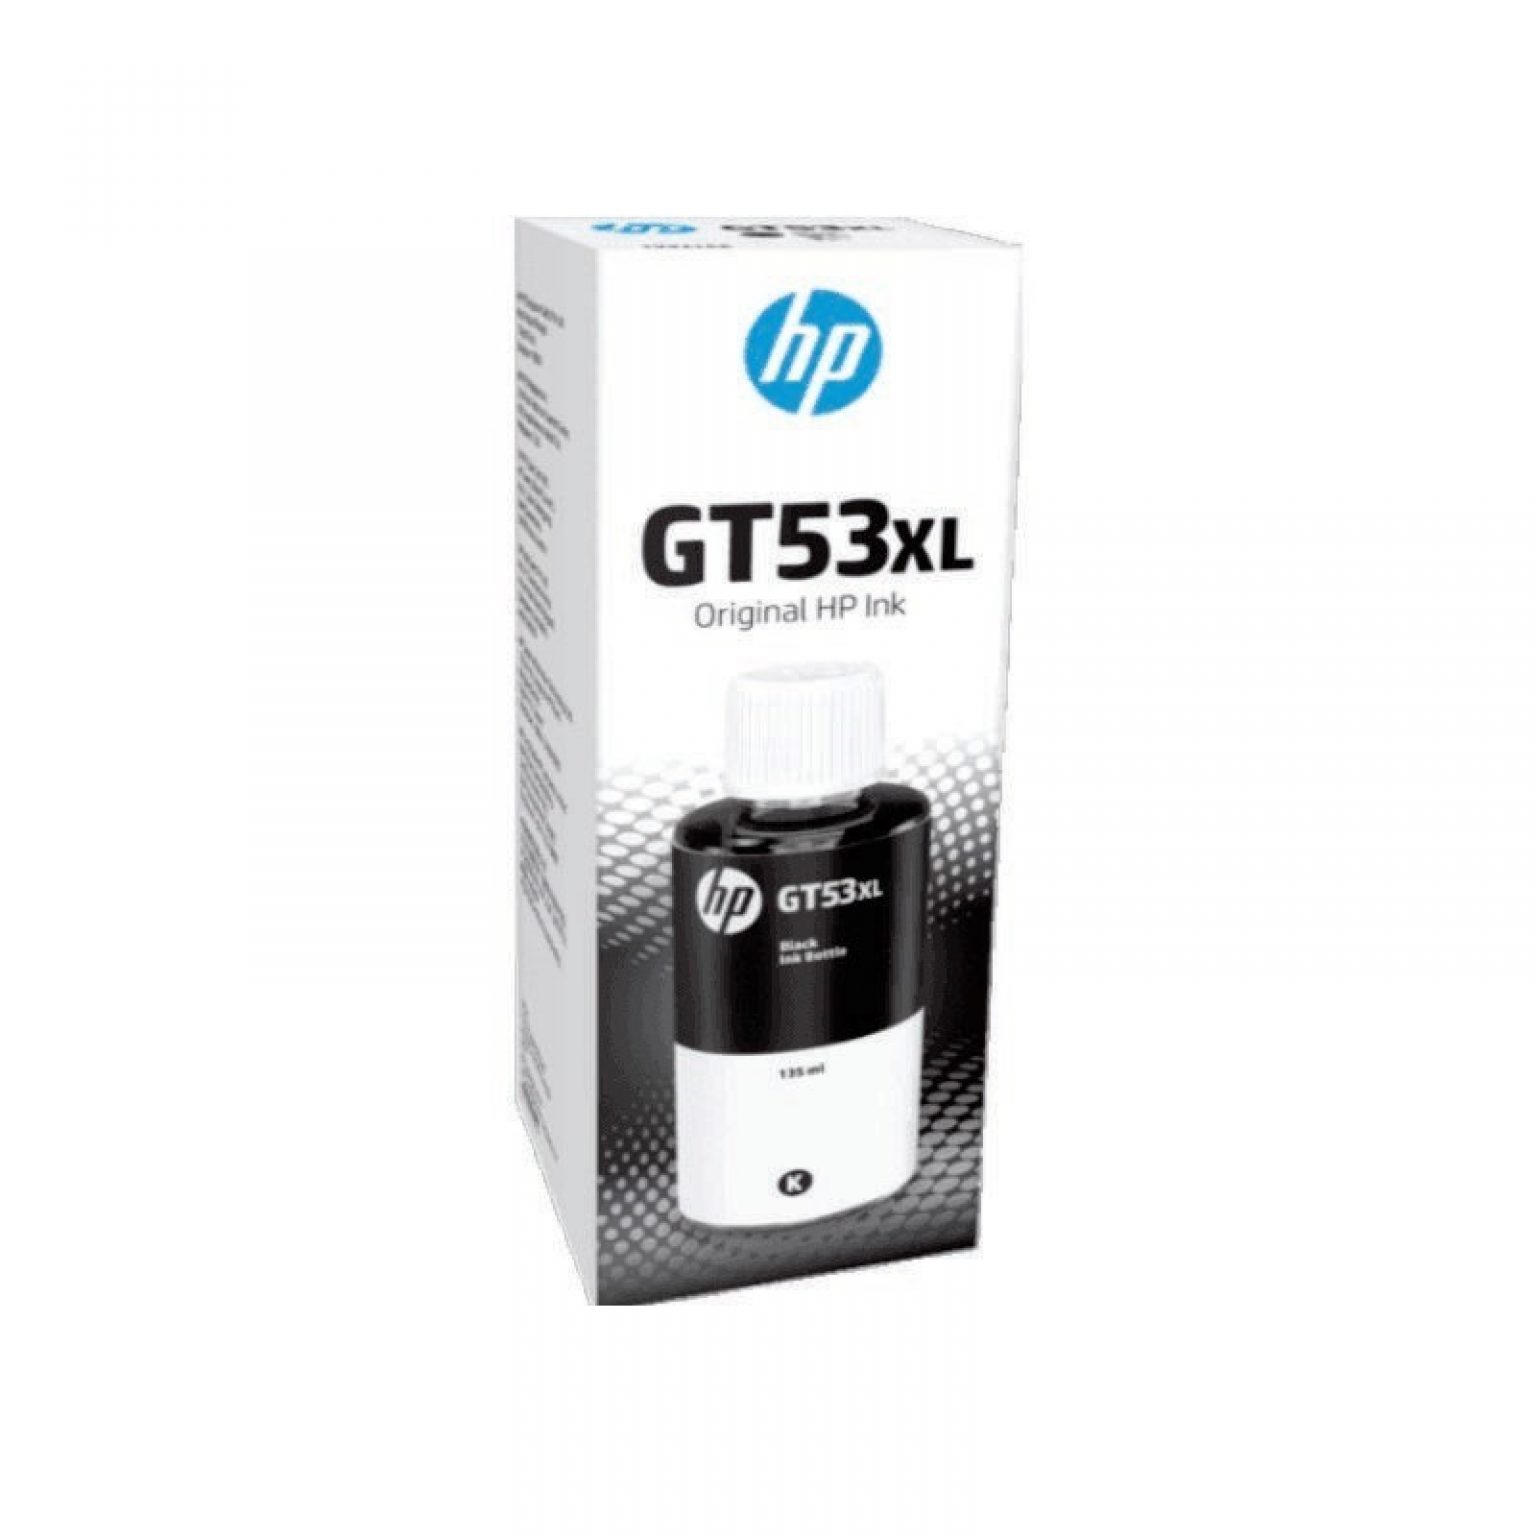 HP - GT53XL 135ml Black Original Ink Bottle [1VV21AA]